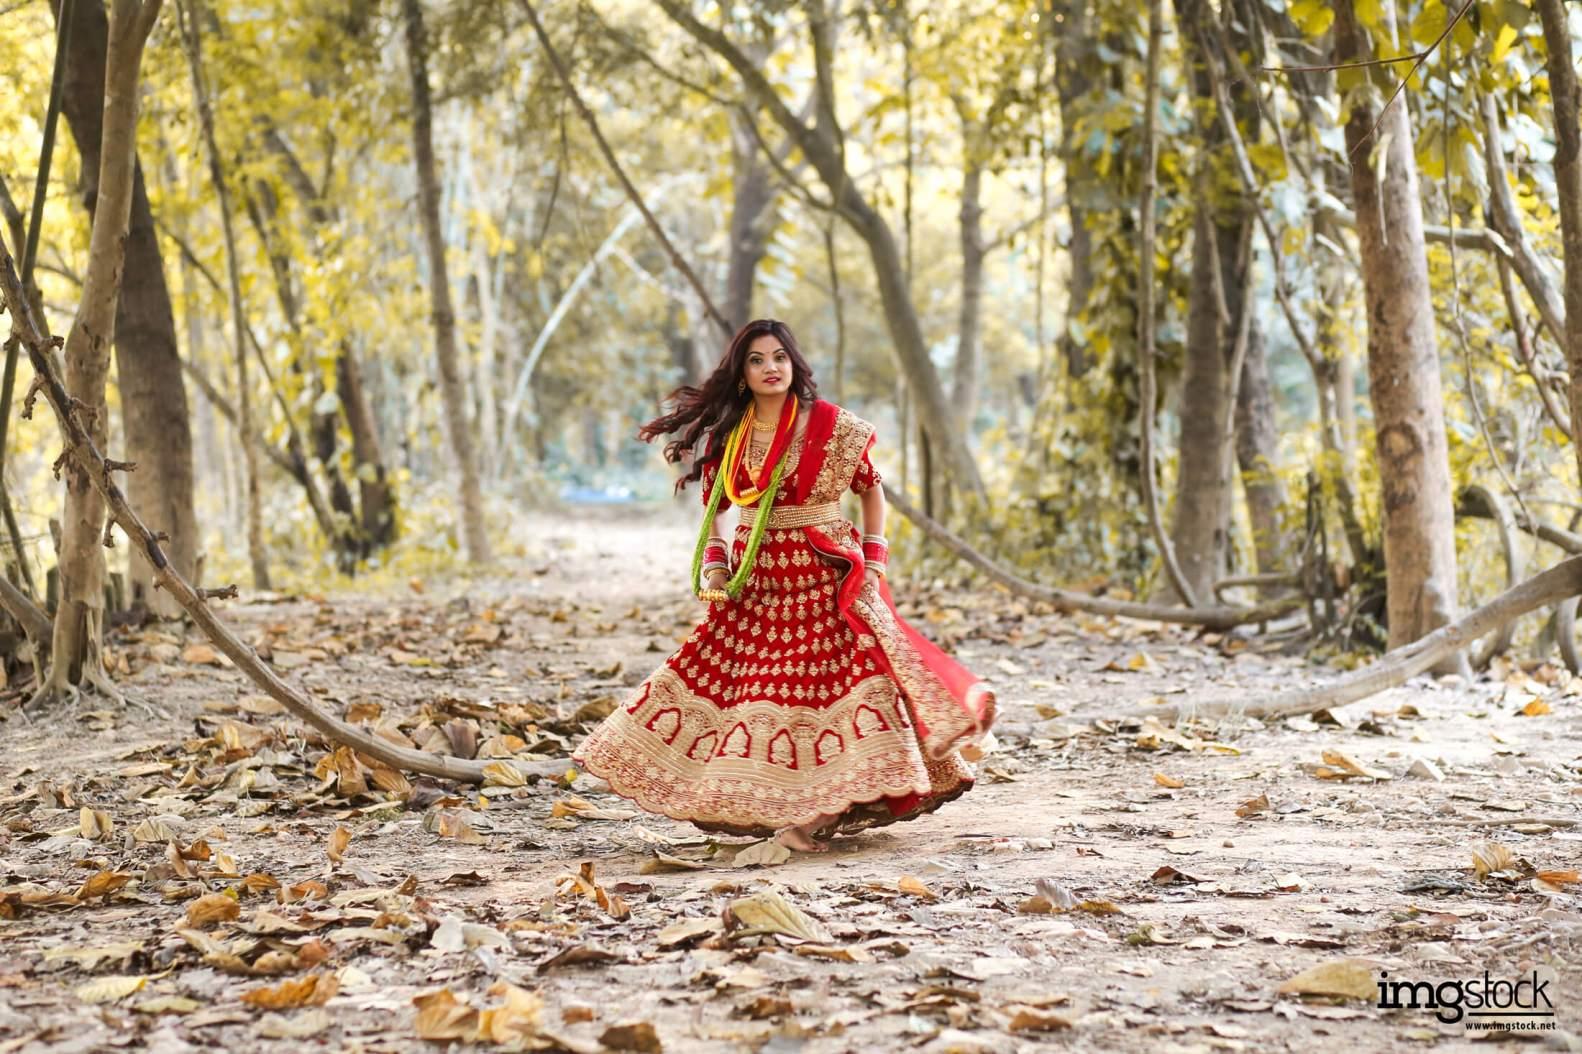 Riya Post Wedding - ImgStock